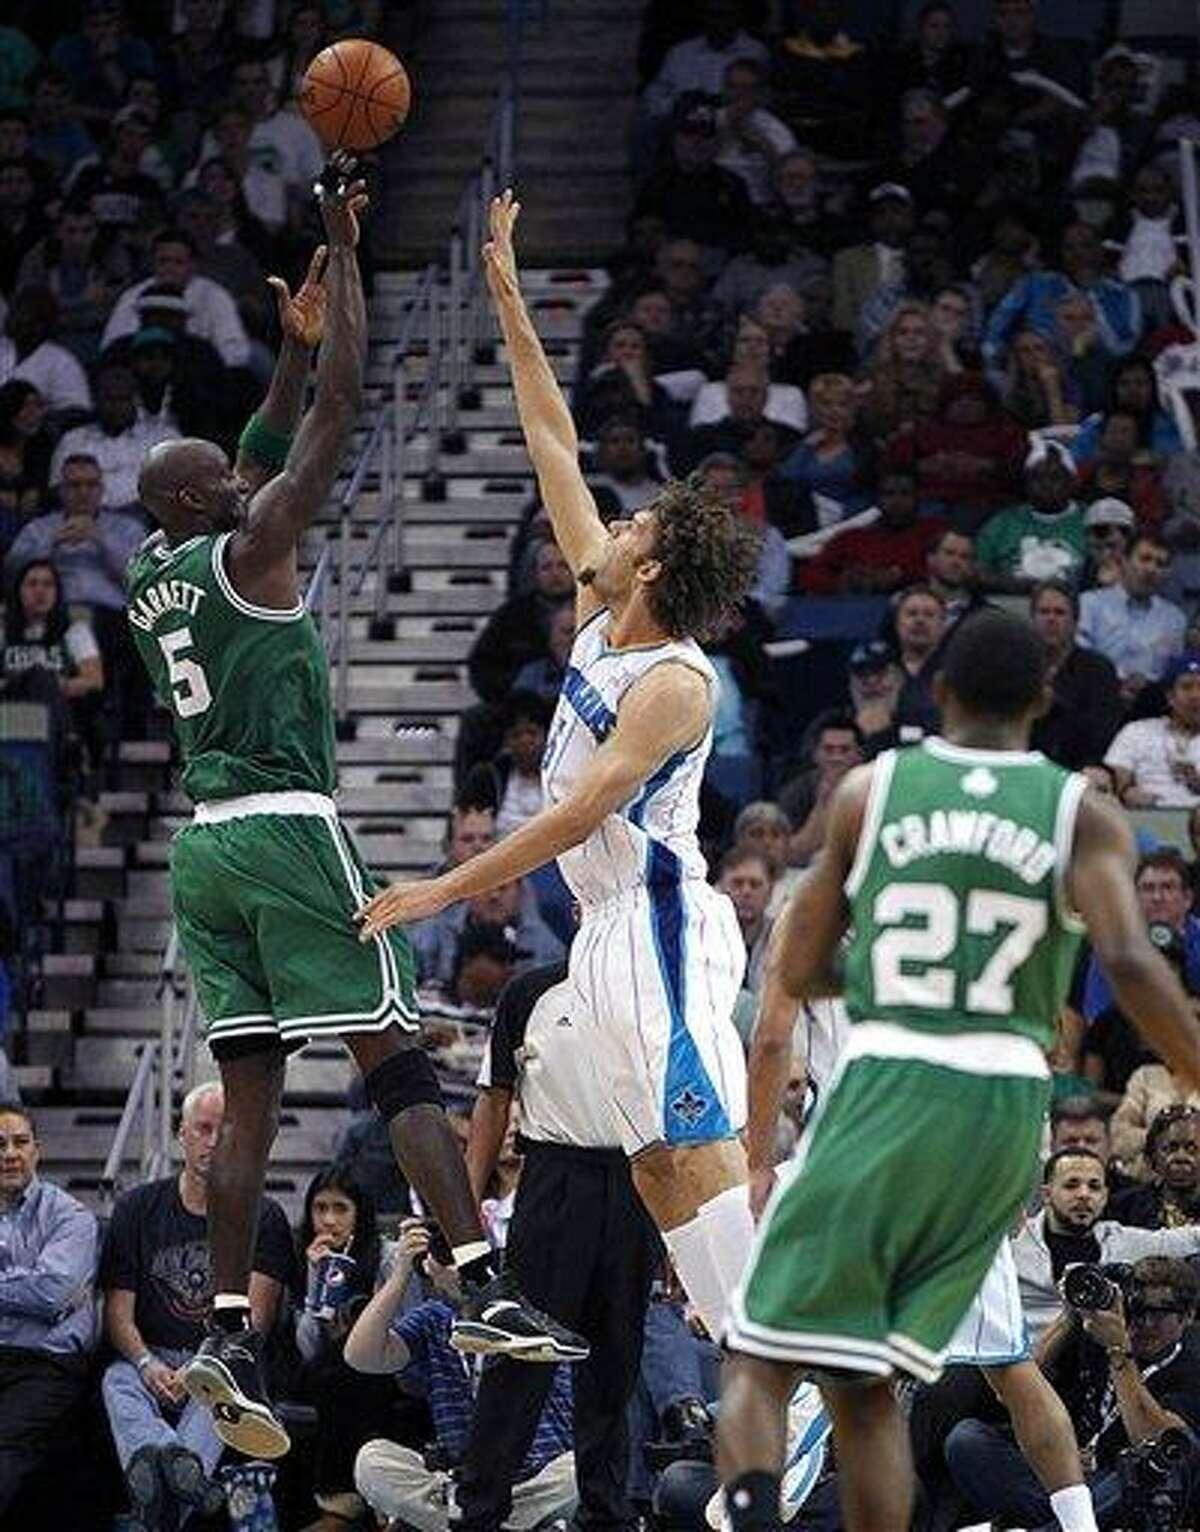 Boston Celtics center Kevin Garnett (5) shoots over New Orleans Hornets center Robin Lopez in the second half of an NBA basketball game in New Orleans, Wednesday, March 20, 2013. The Hornets won 87-86. (AP Photo/Gerald Herbert)